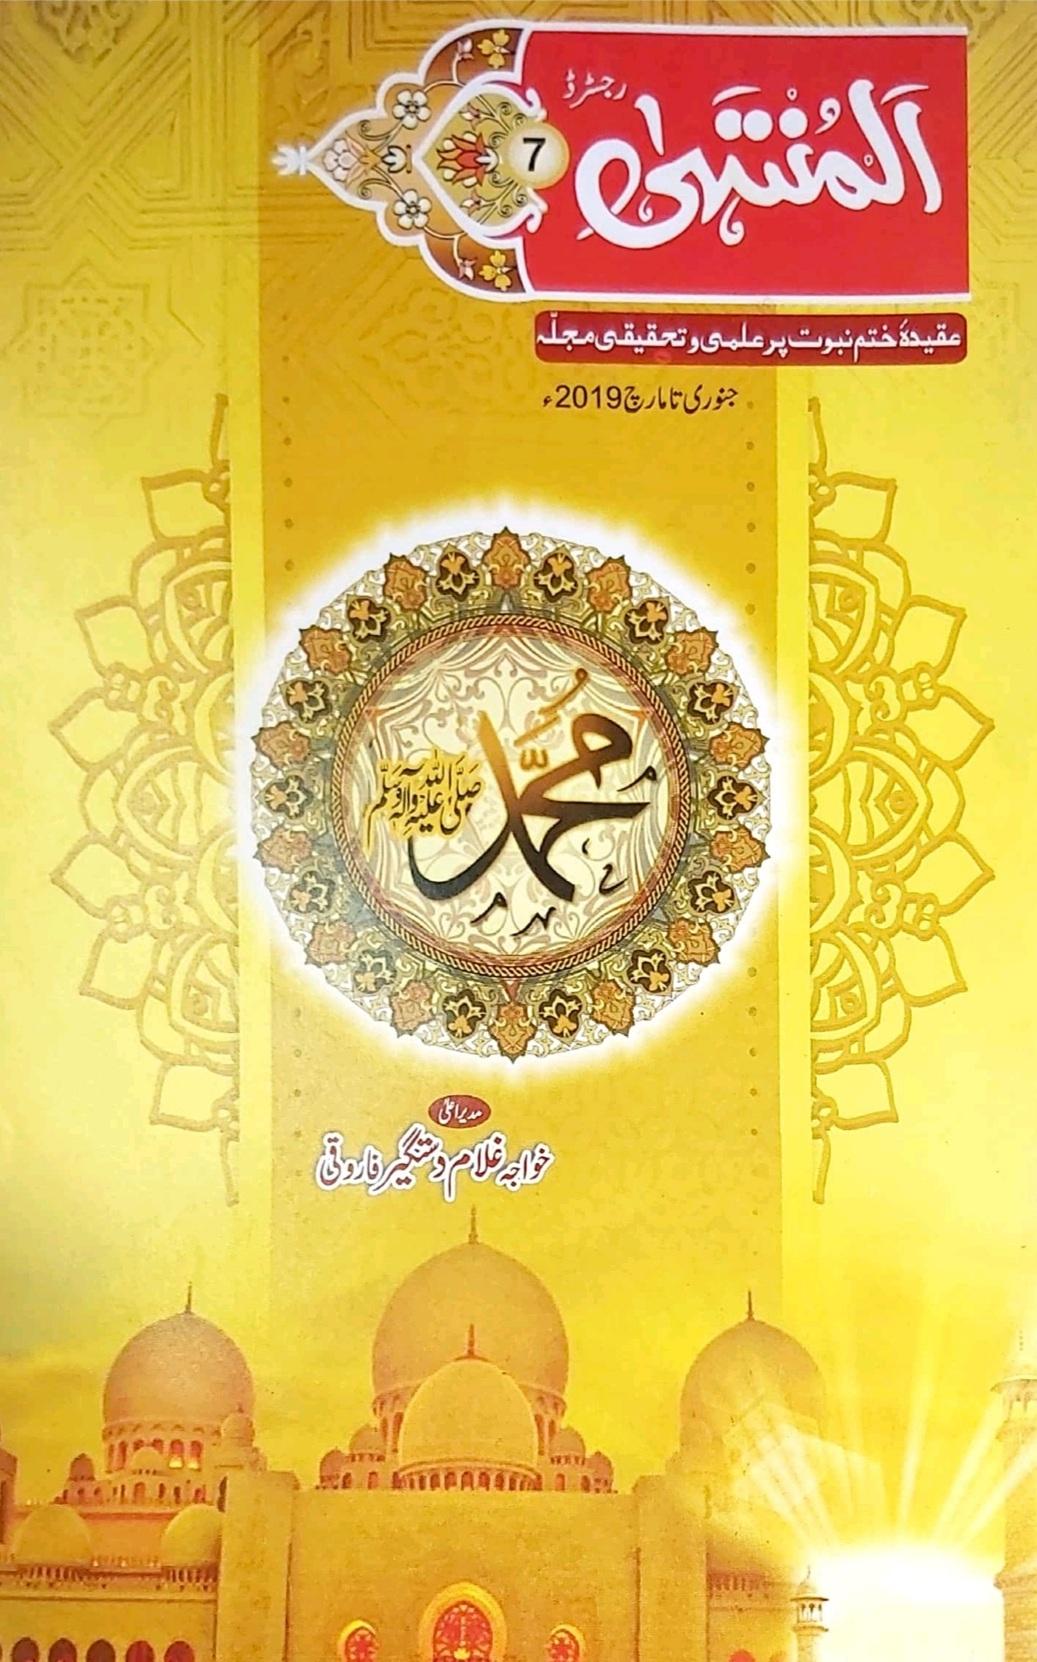 Al Muntaha Shumarah # 7 / المنتہے المنتھی المنتھے شمارہ 7by خواجہ غلام دستگیر فاروقی